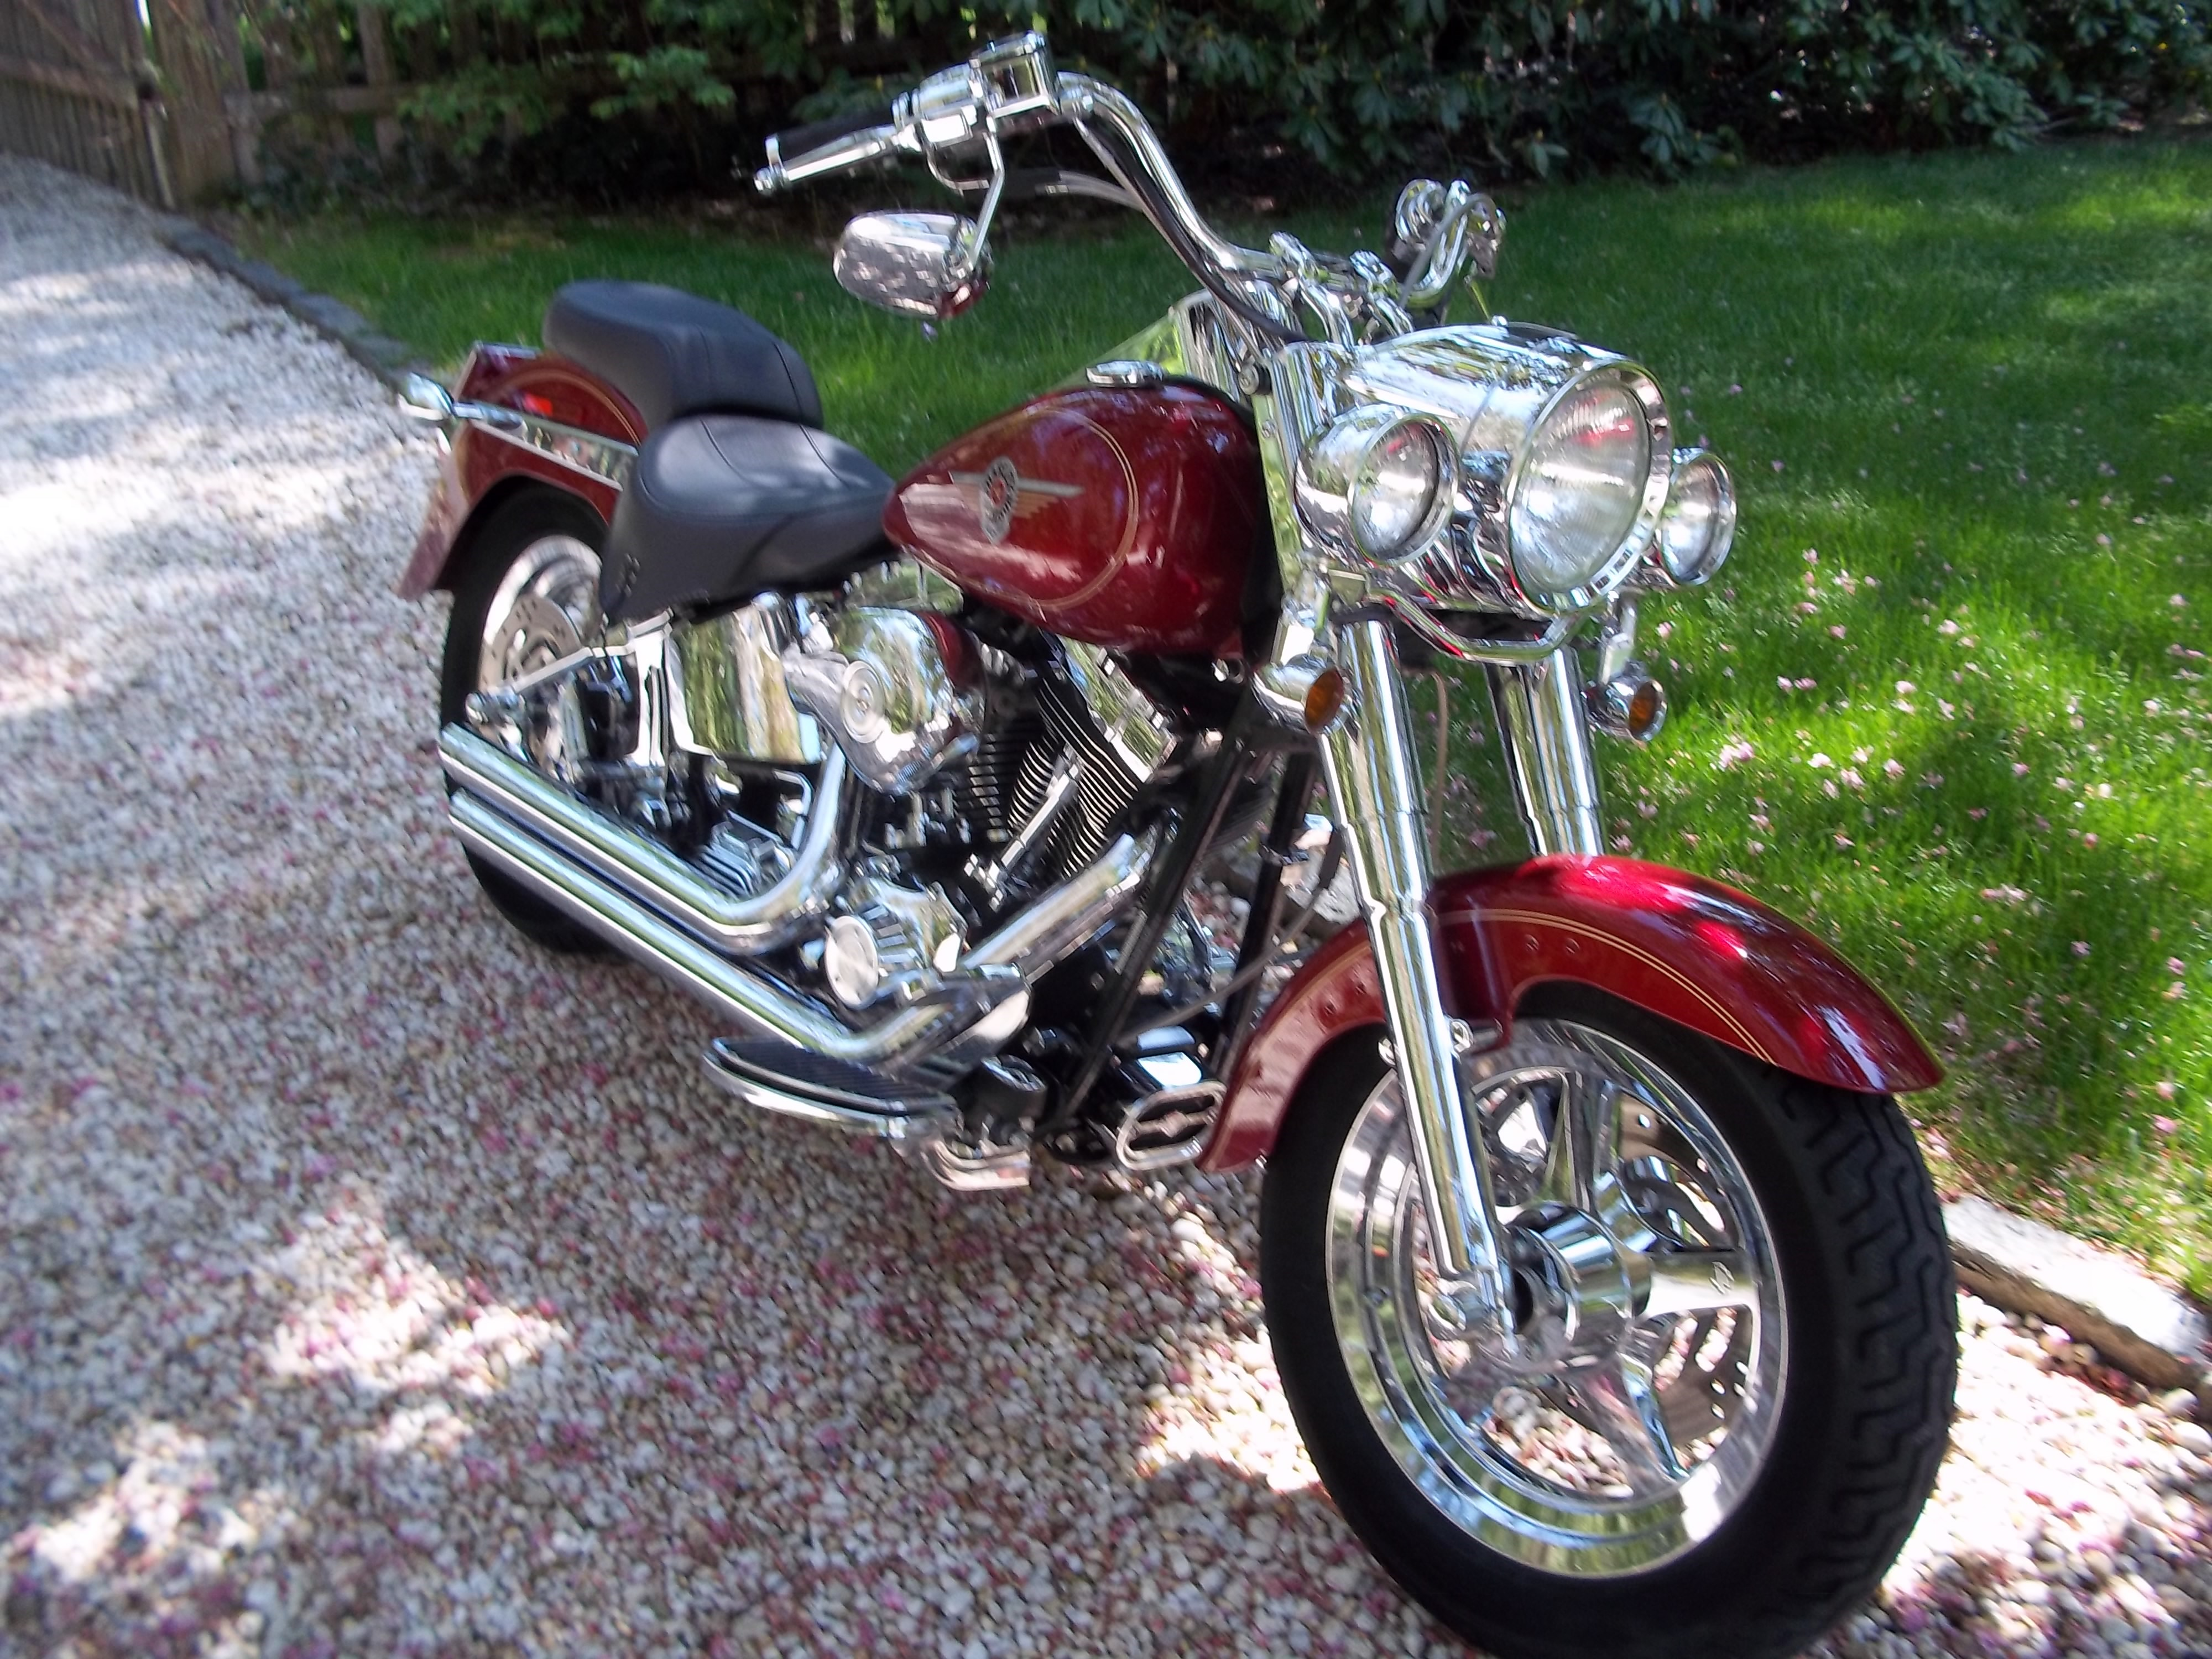 2004 Harley Davidson 174 Flstf I Softail 174 Fat Boy 174 Lava Red